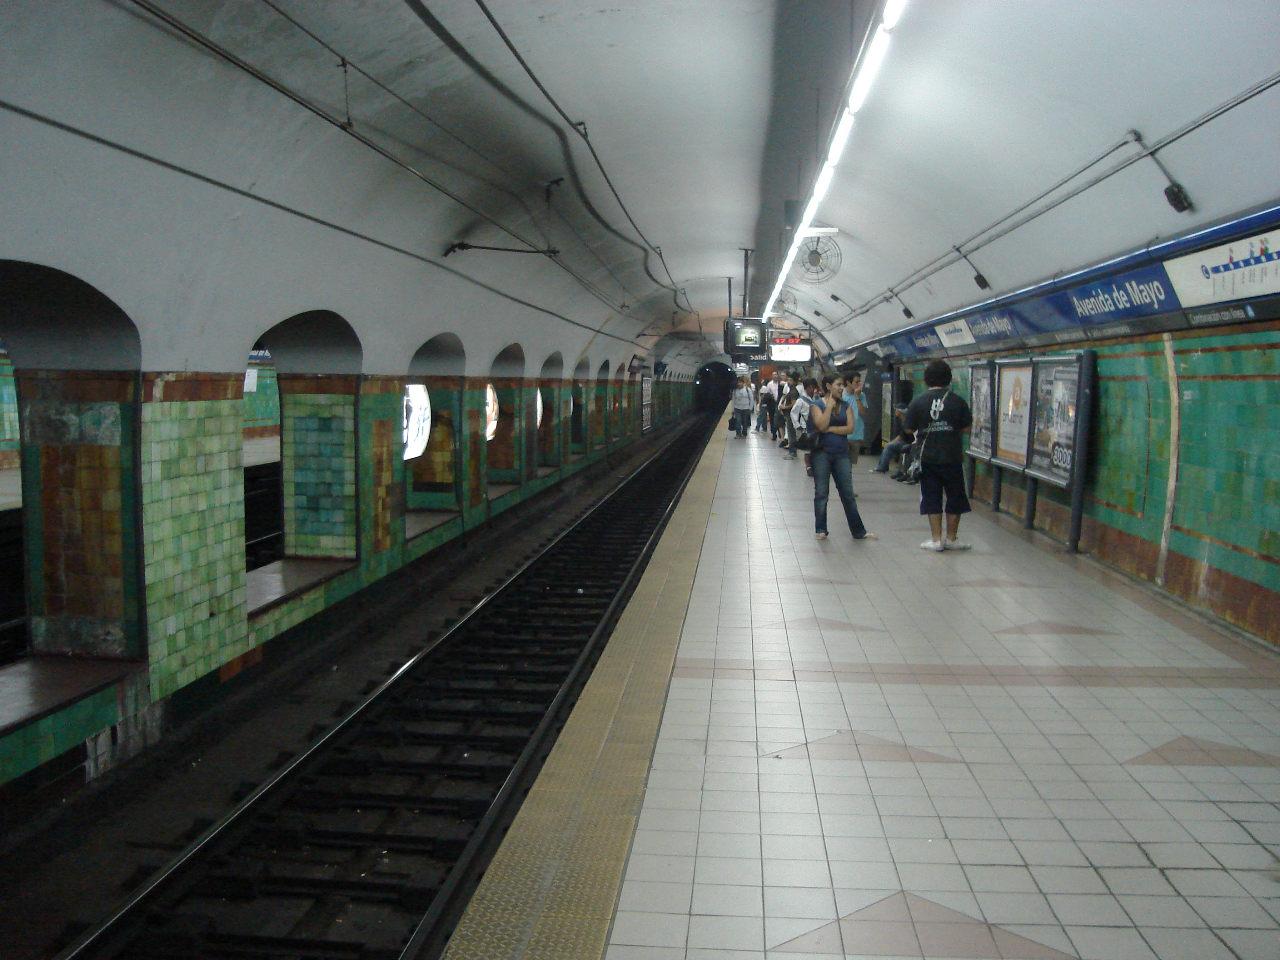 Station Avenida de Mayo - Almagro - peintures